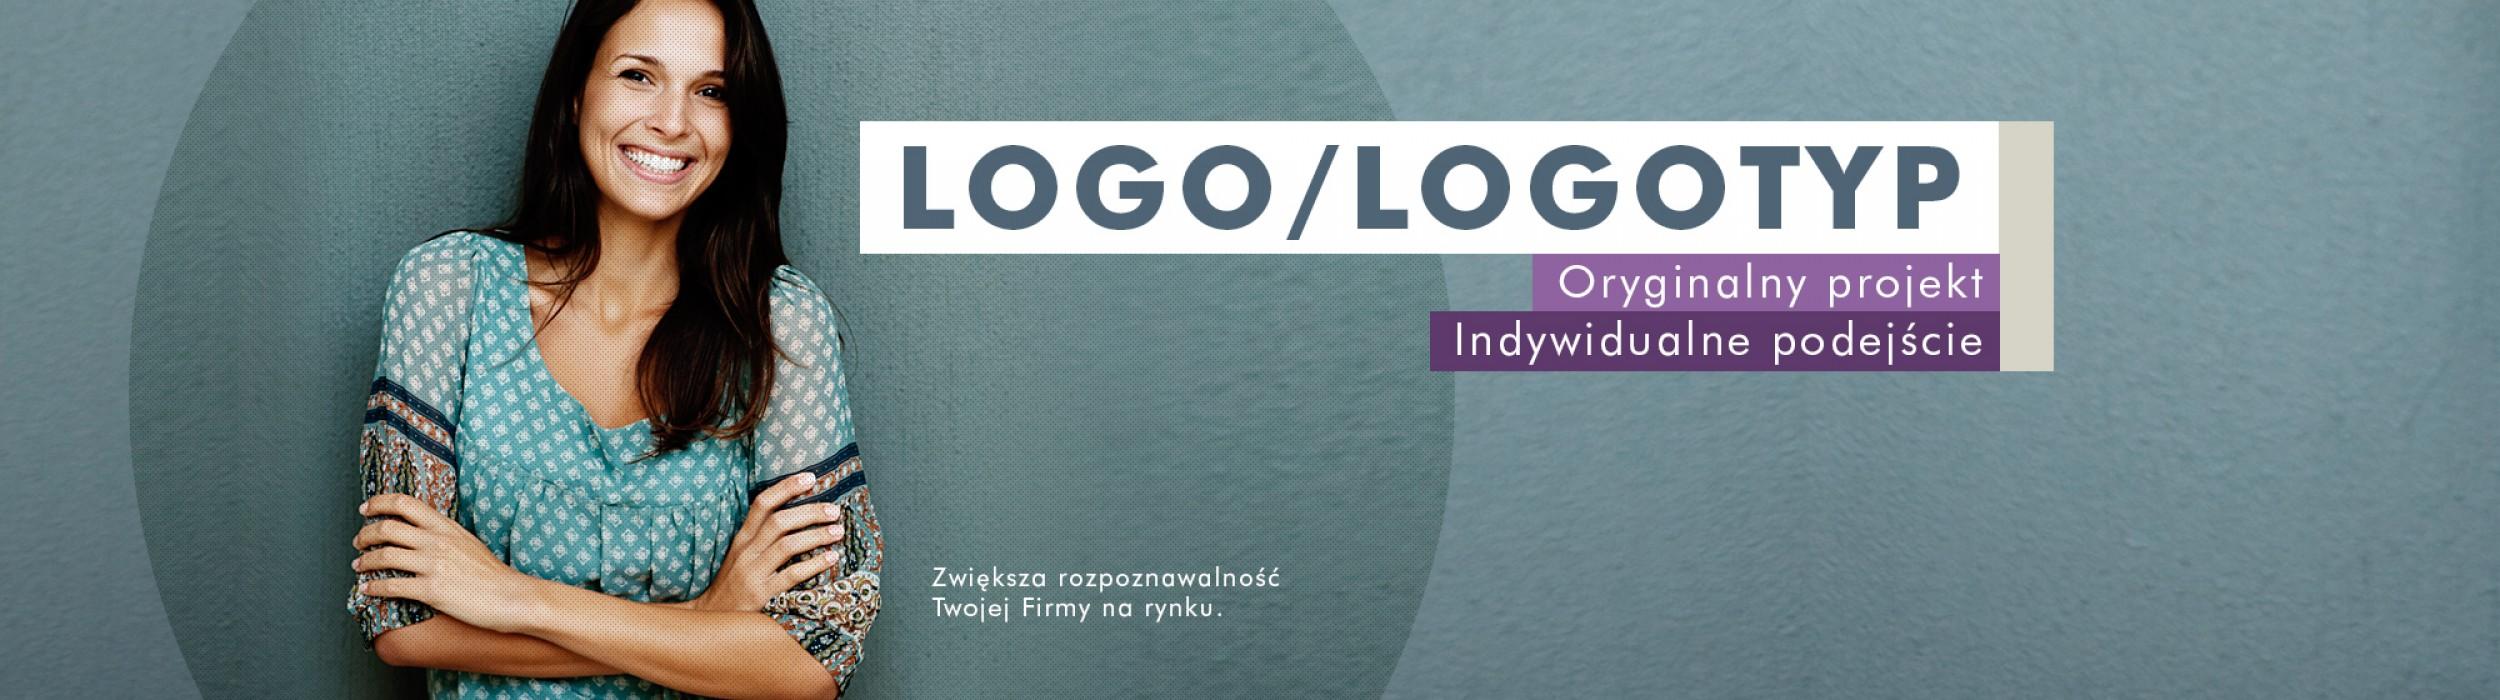 Projekt logo / logotypu